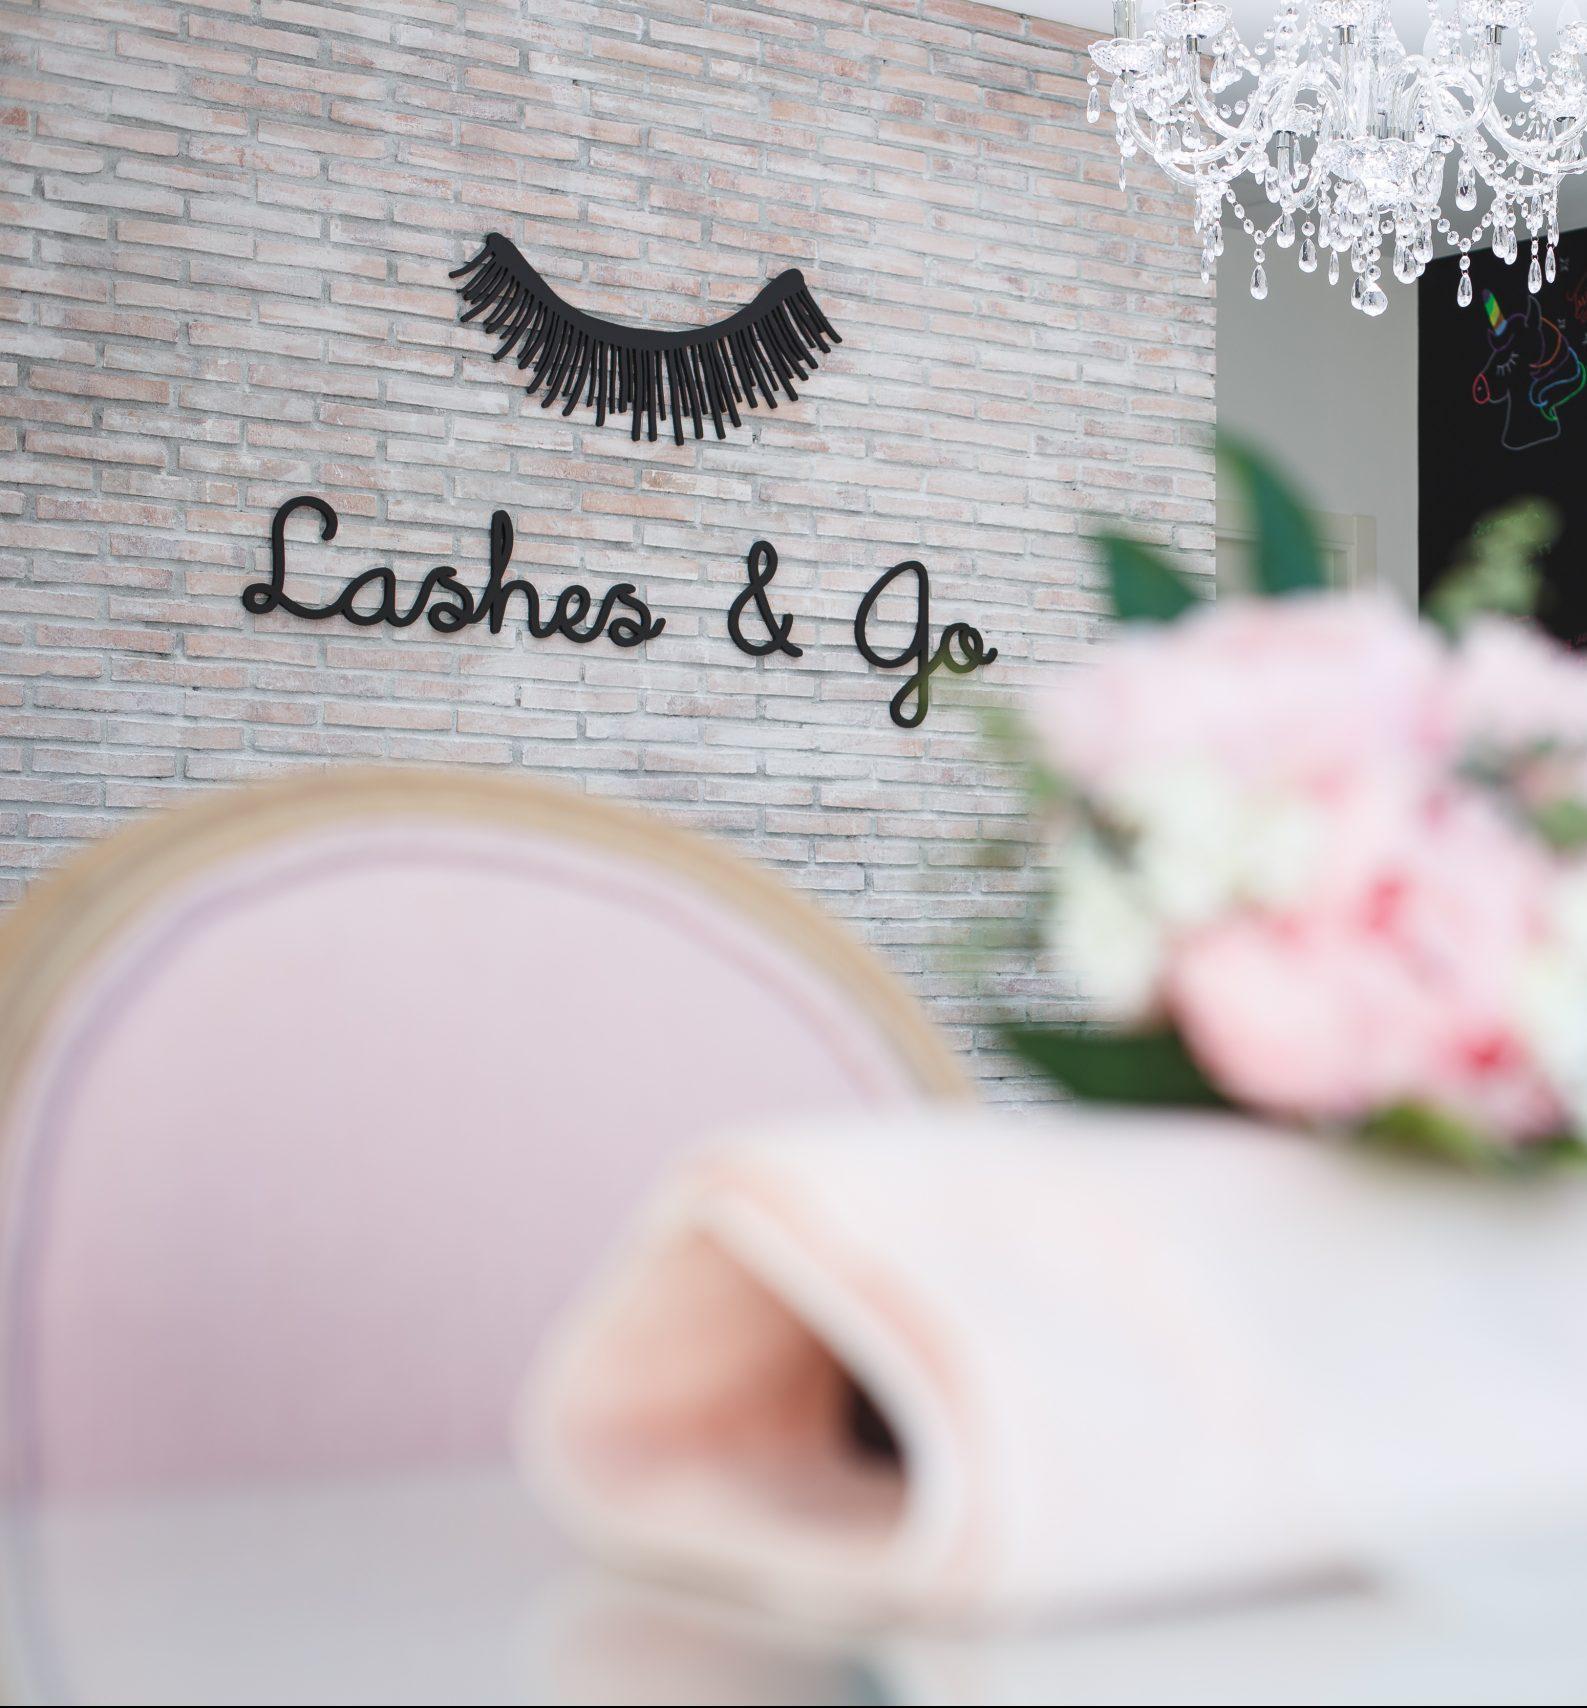 Descubre Lashes & Go, una franquicia de éxito